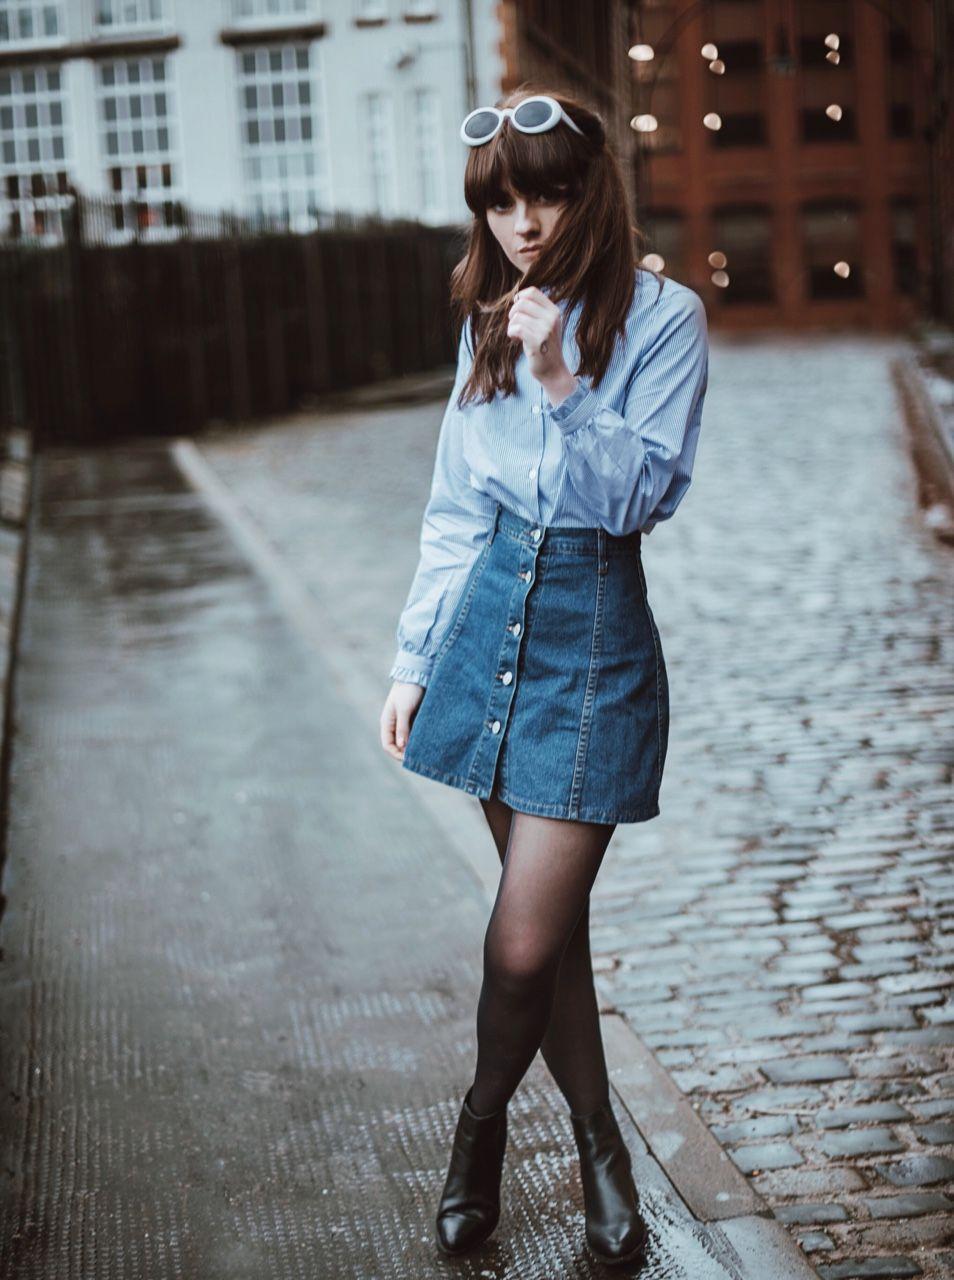 denim skirt revival alice catherine outfits pinterest tenue mode femme and mode. Black Bedroom Furniture Sets. Home Design Ideas